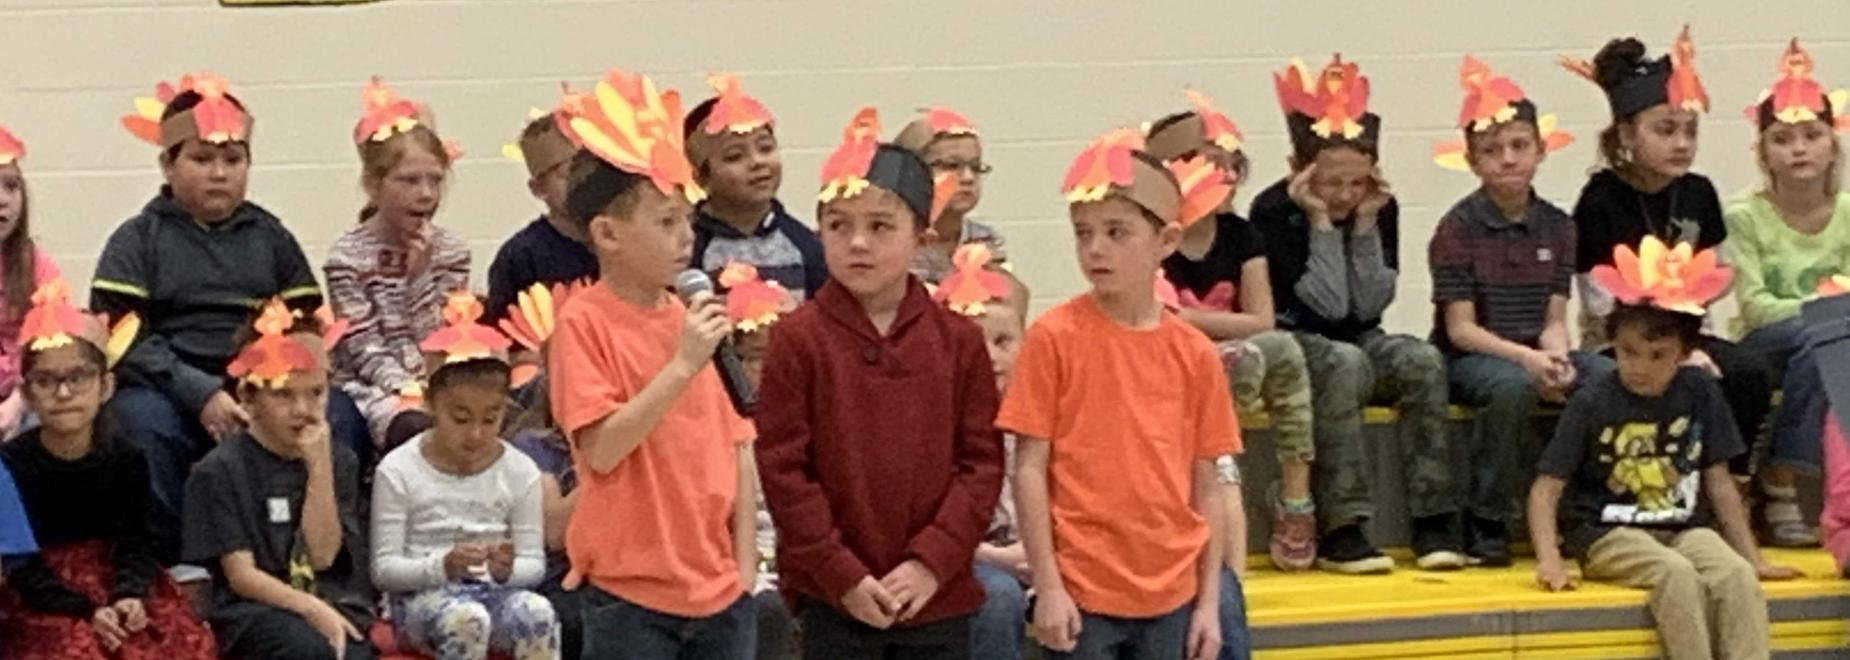 Photo of 2nd Grade Music Program